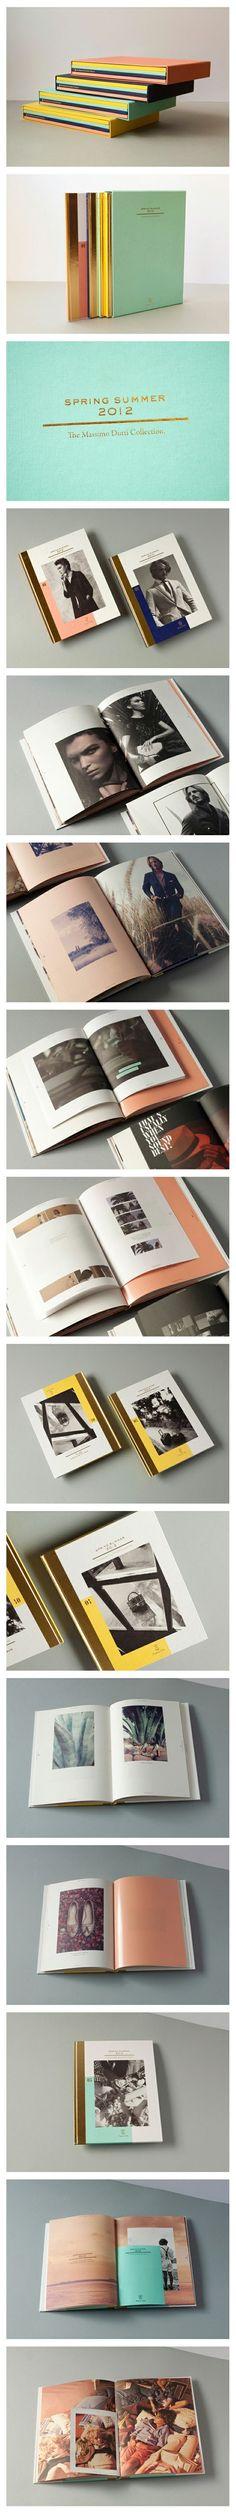 elementos de color / fondeados http://www.behance.net/gallery/Massimo-Dutti-SS-012-Catalogue/6919775